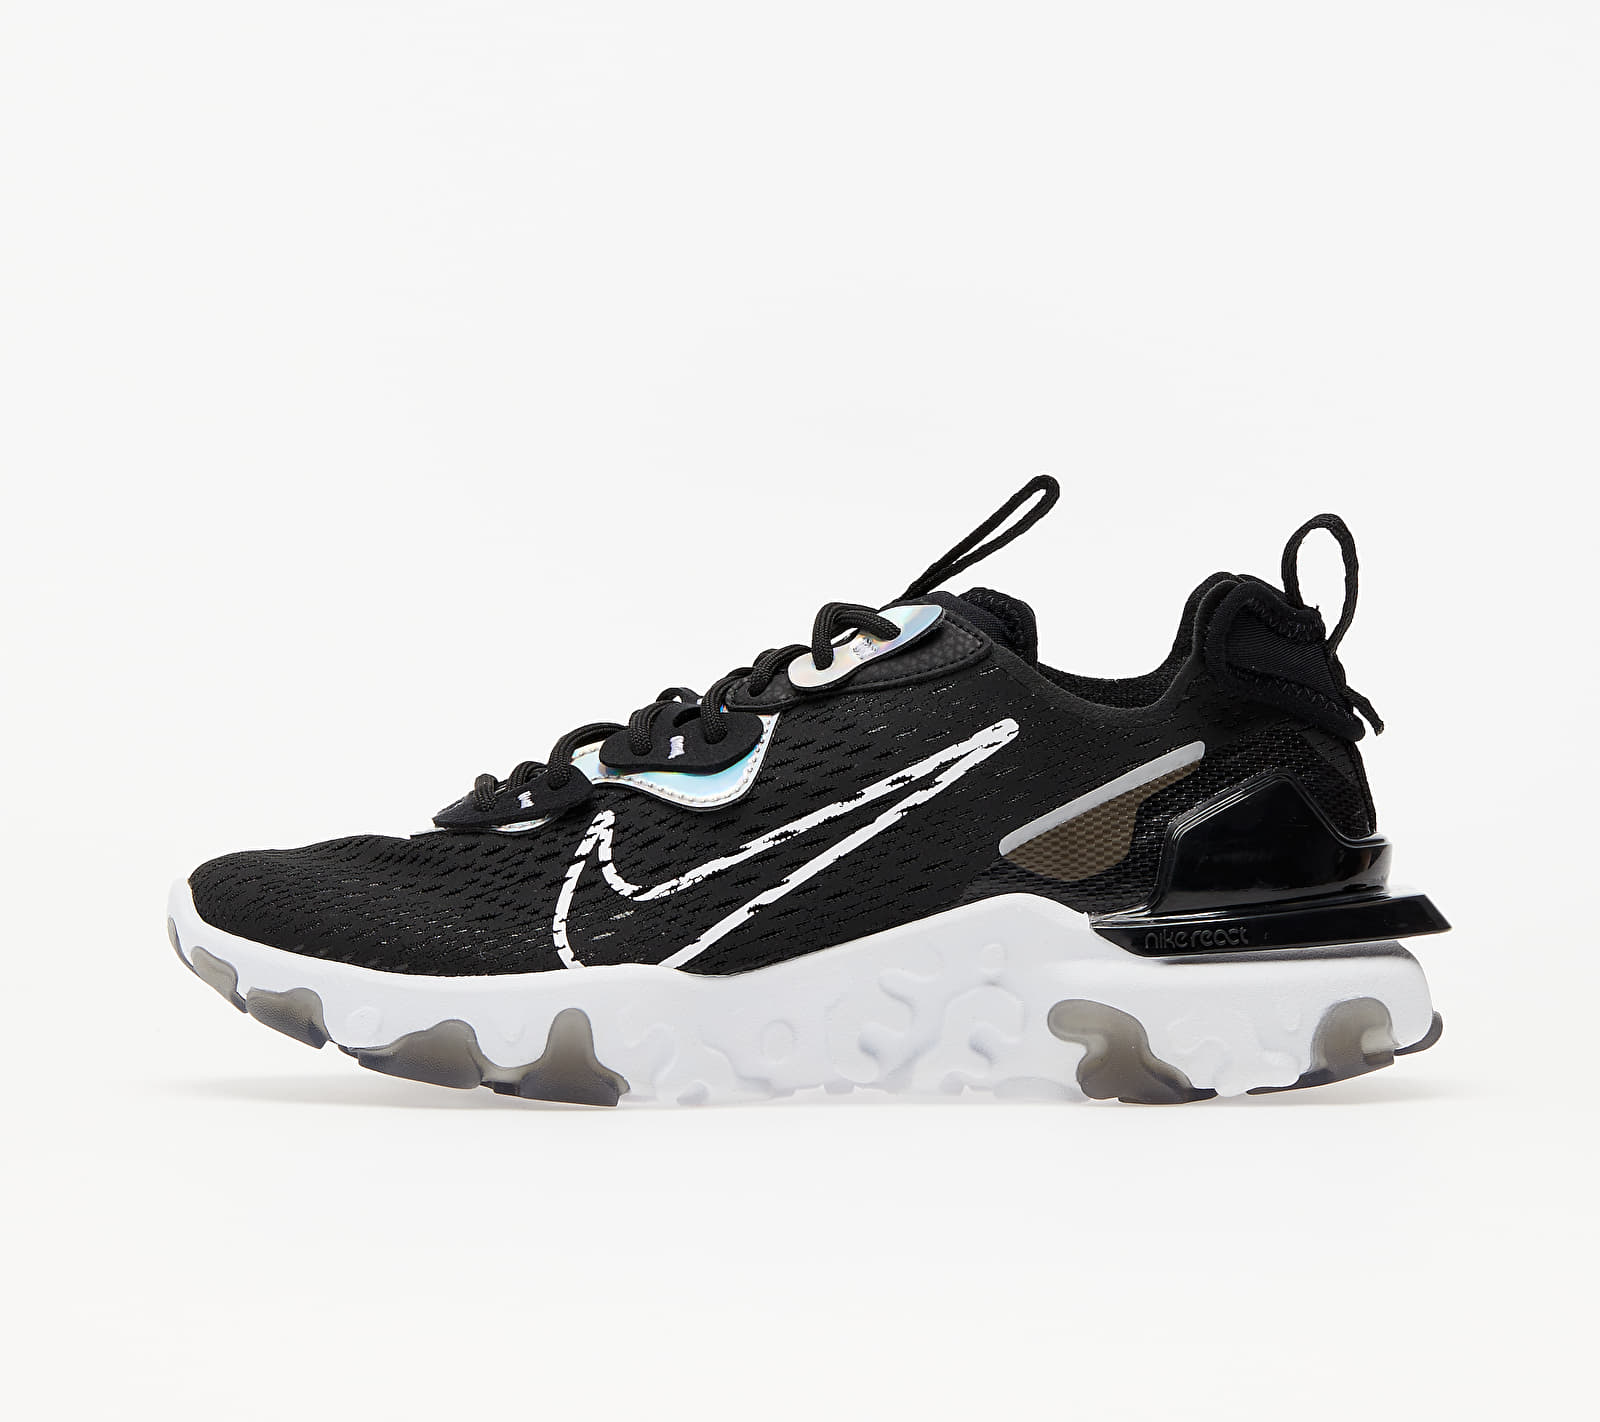 Nike W NSW React Vision Essential Black/ White-Black CW0730-001